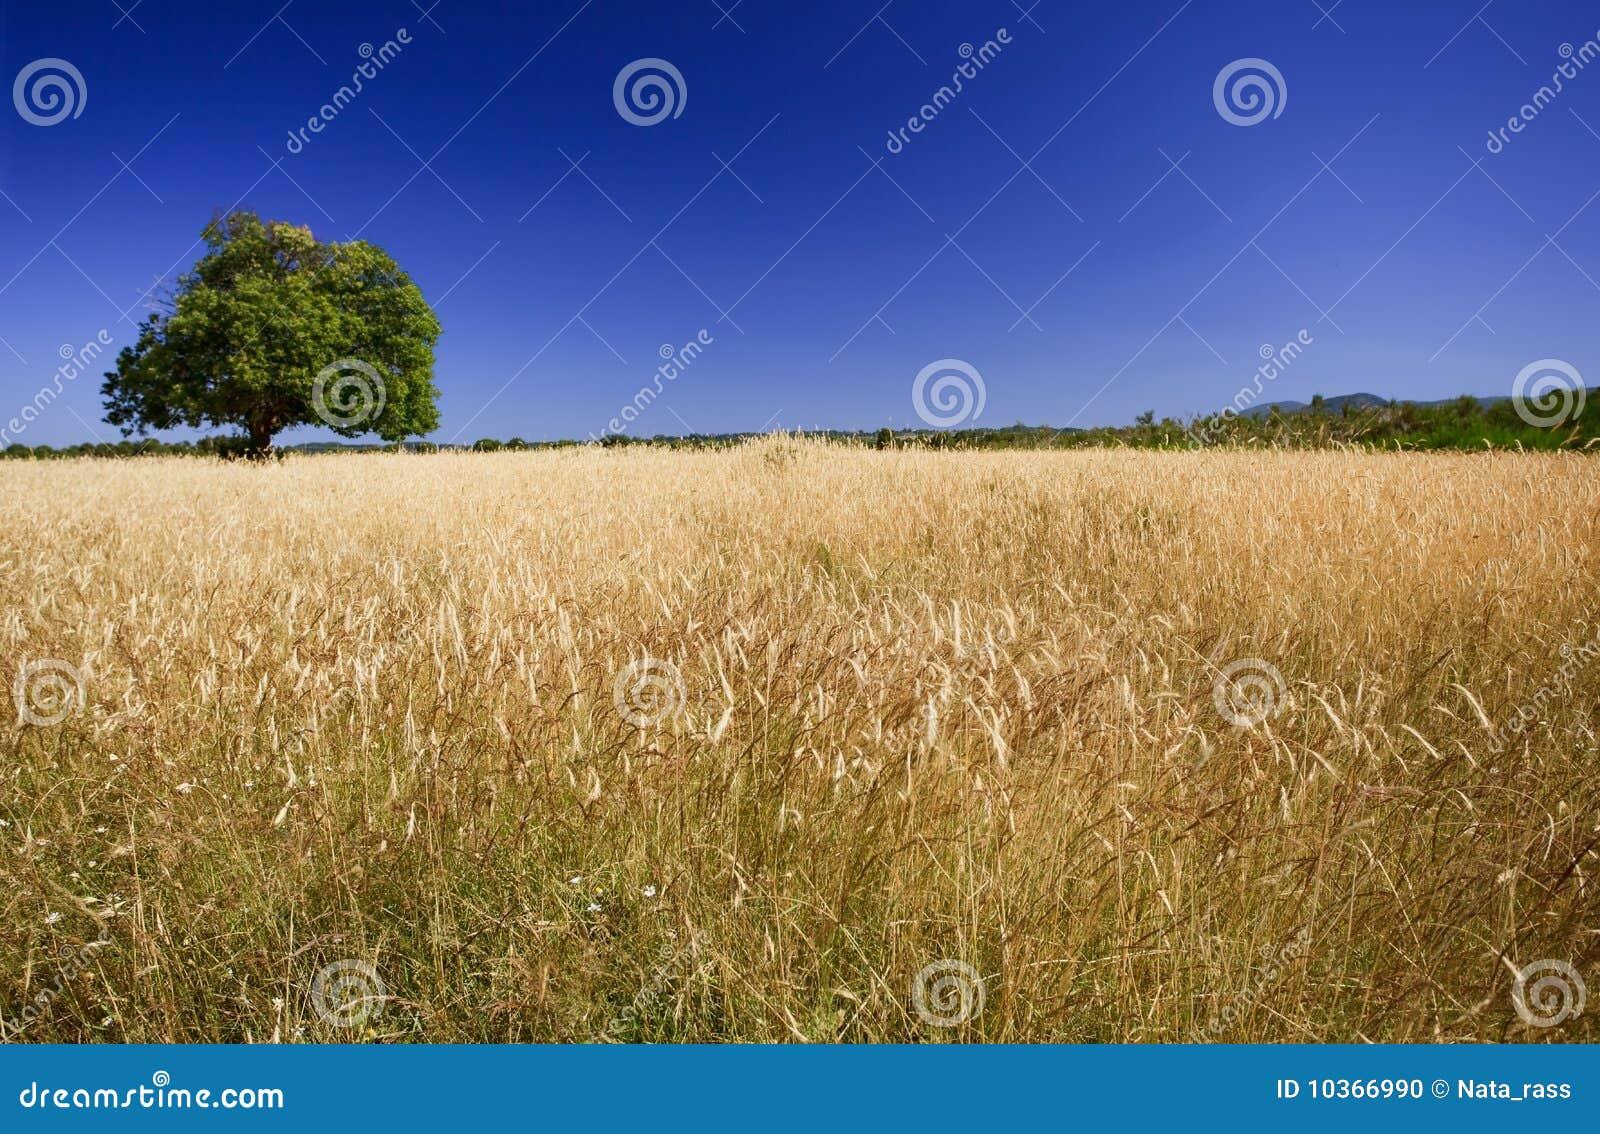 Bright colors of harvest season